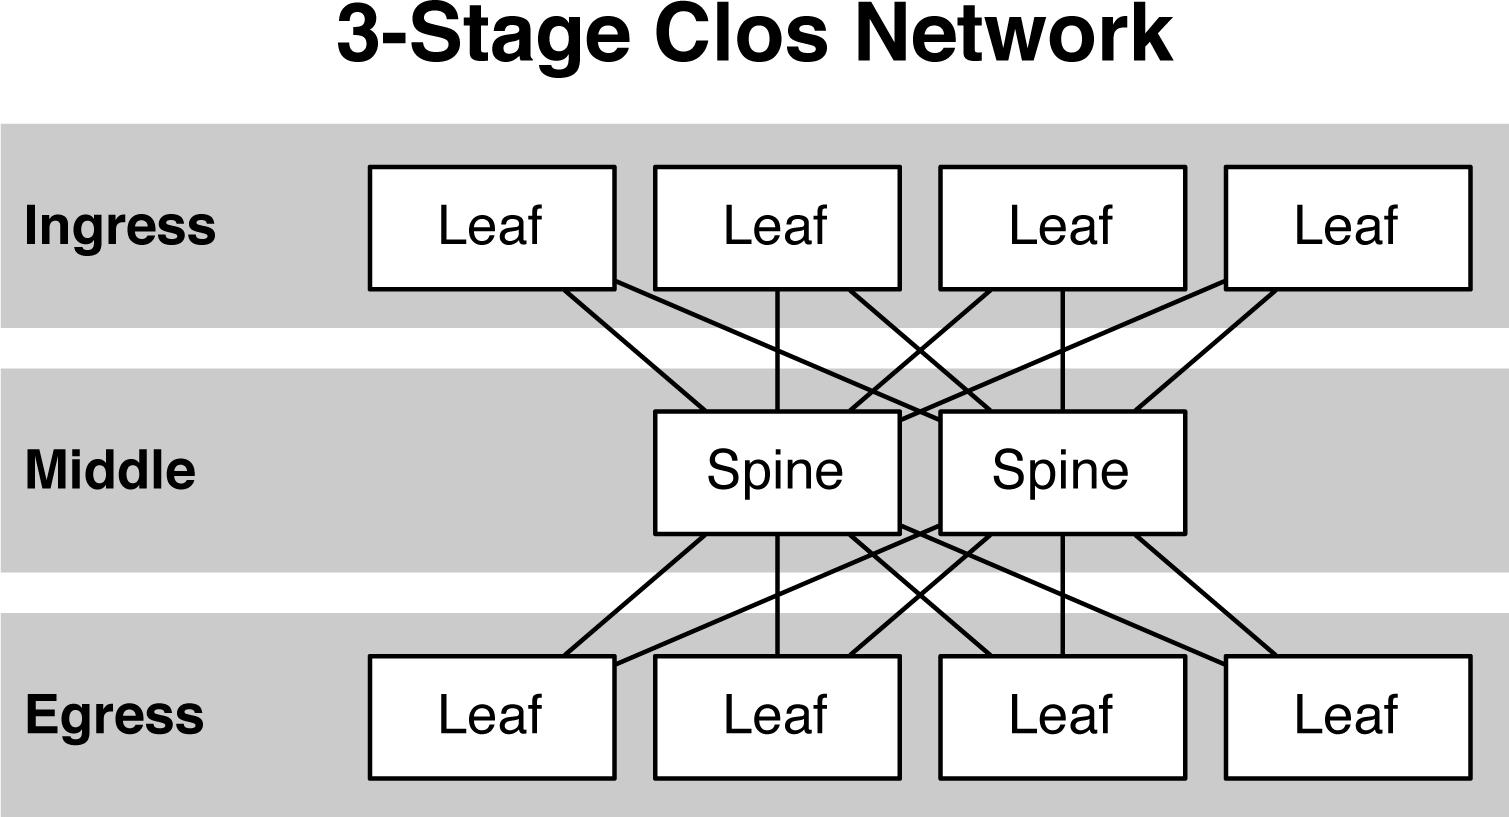 Cisco ACI- Spine-Leaf Architecture - Networks Baseline Private Limited